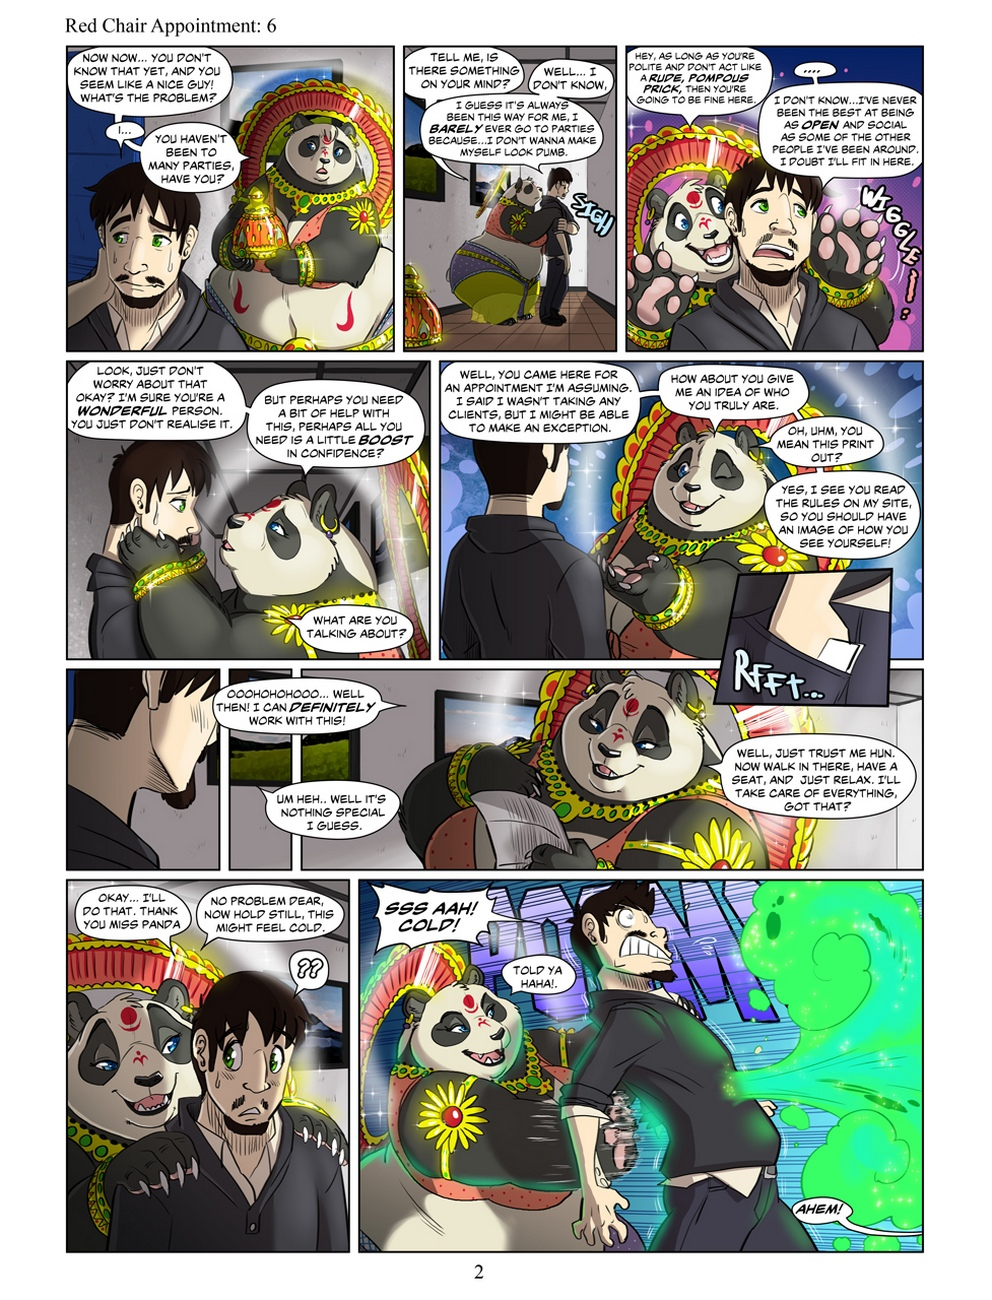 Panda Appointment 6